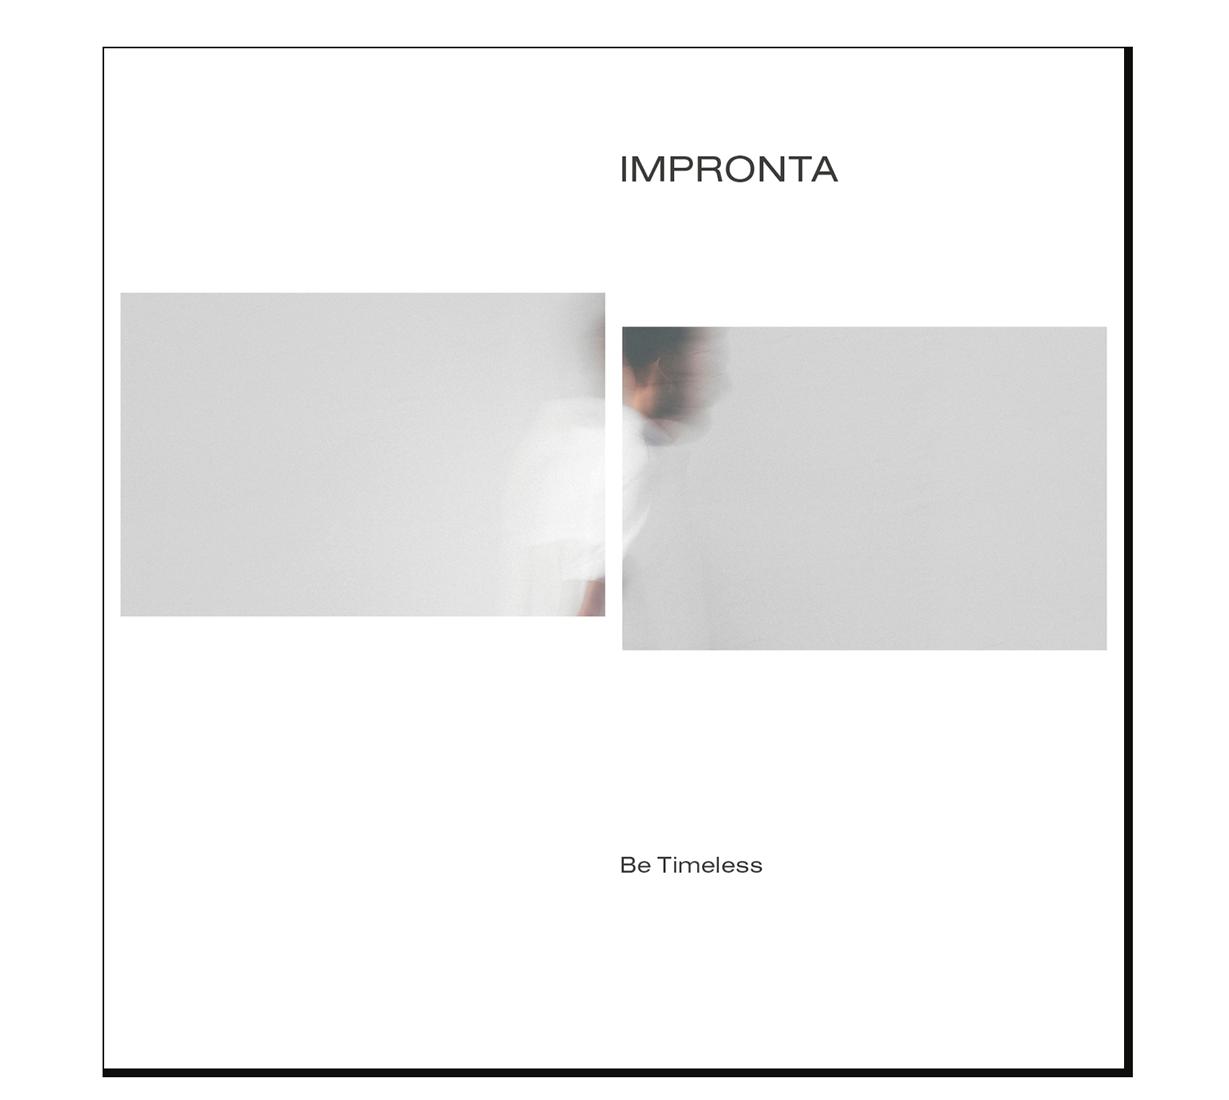 Be Timeless – Impronta Omar Careaga